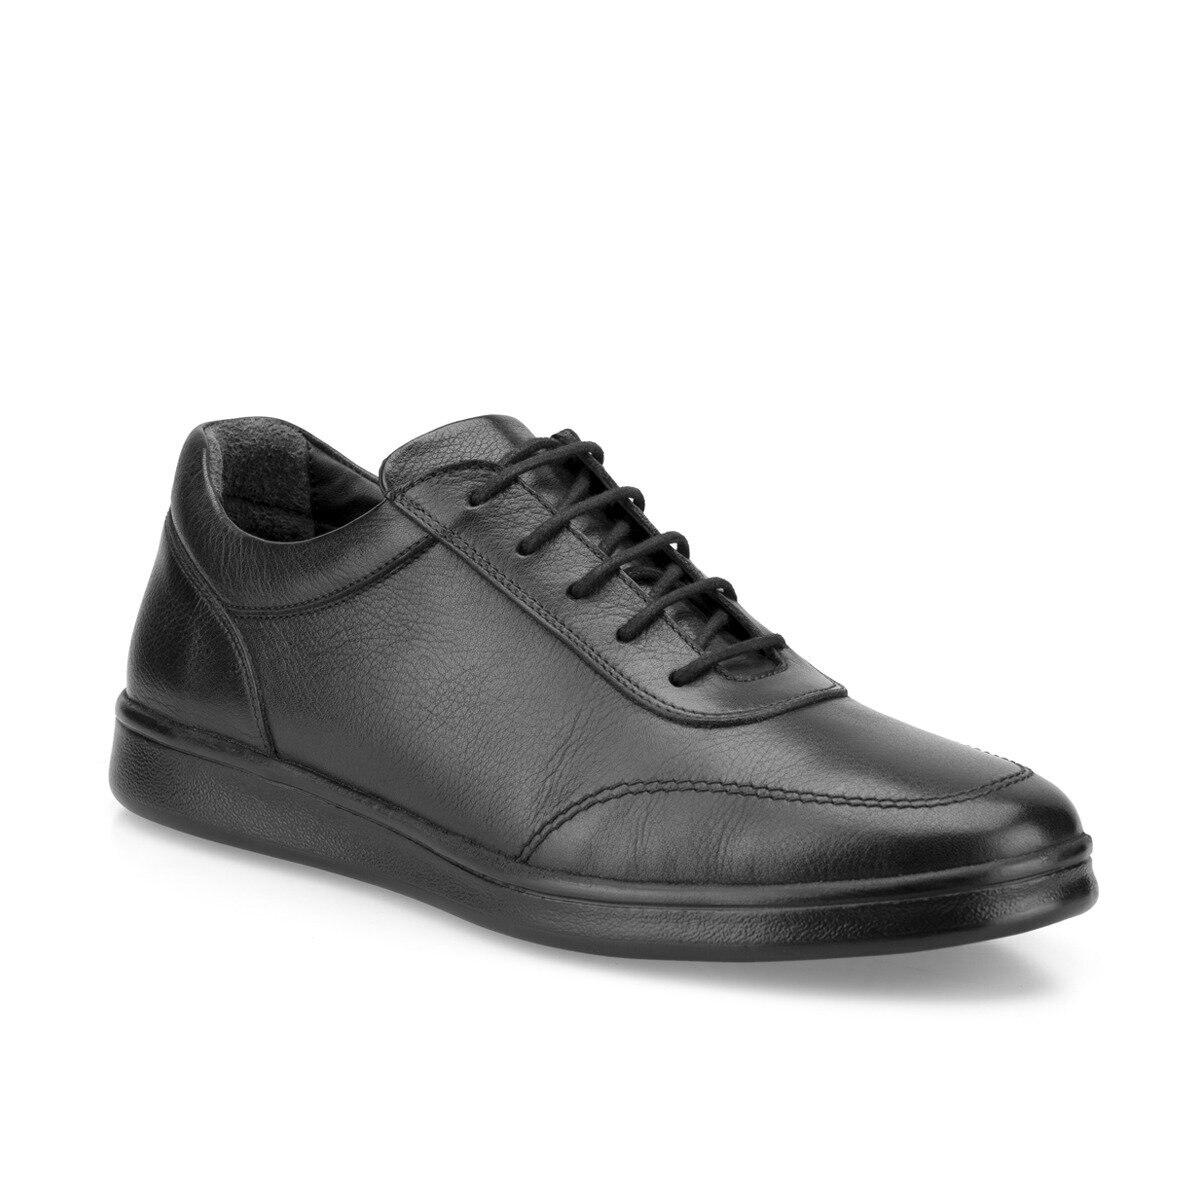 FLO 102017.M zapatos cómodos negros para hombres Polaris 5 puntos